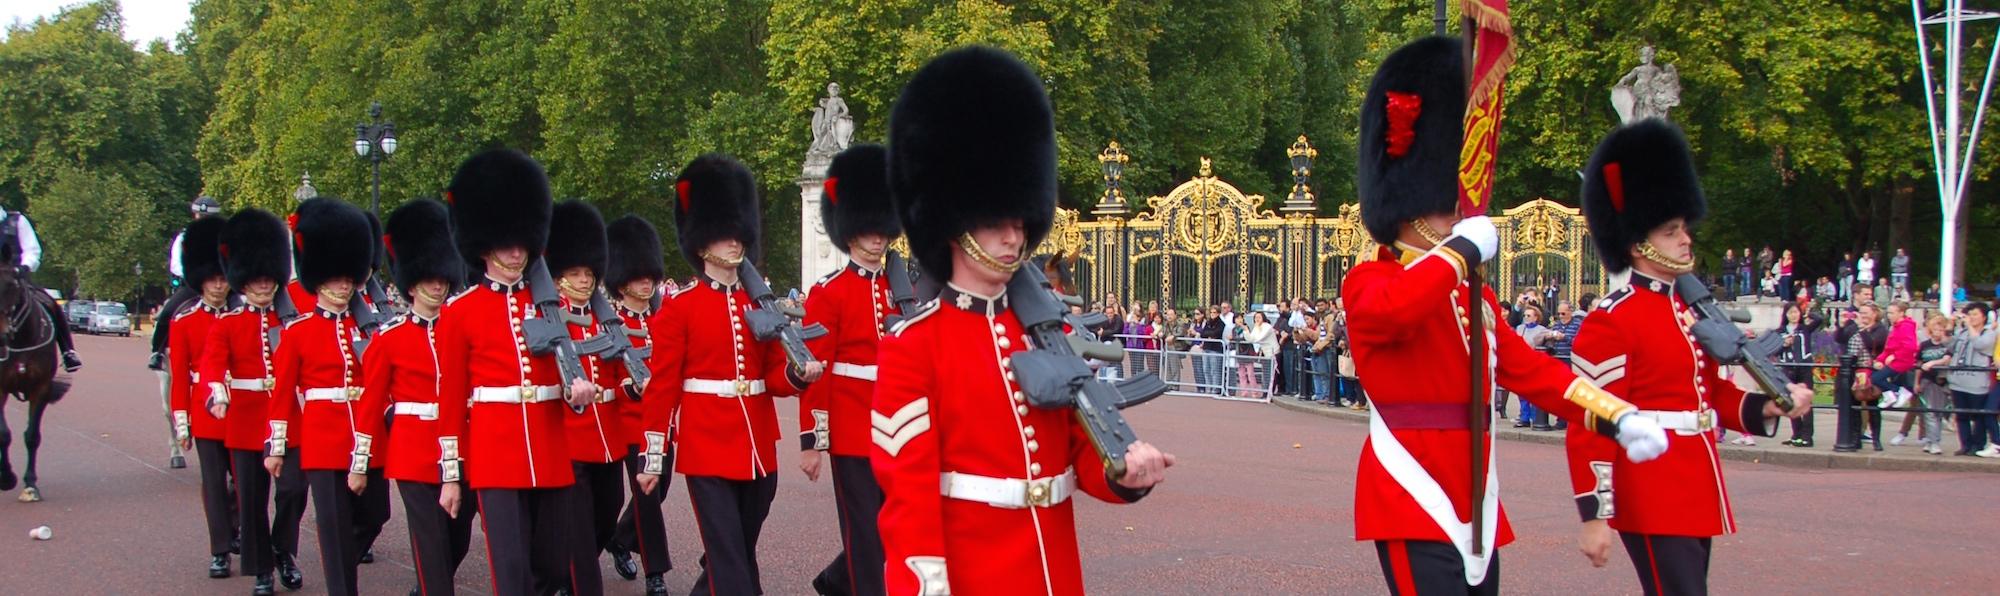 Buckinham Palace Abajo, Londres